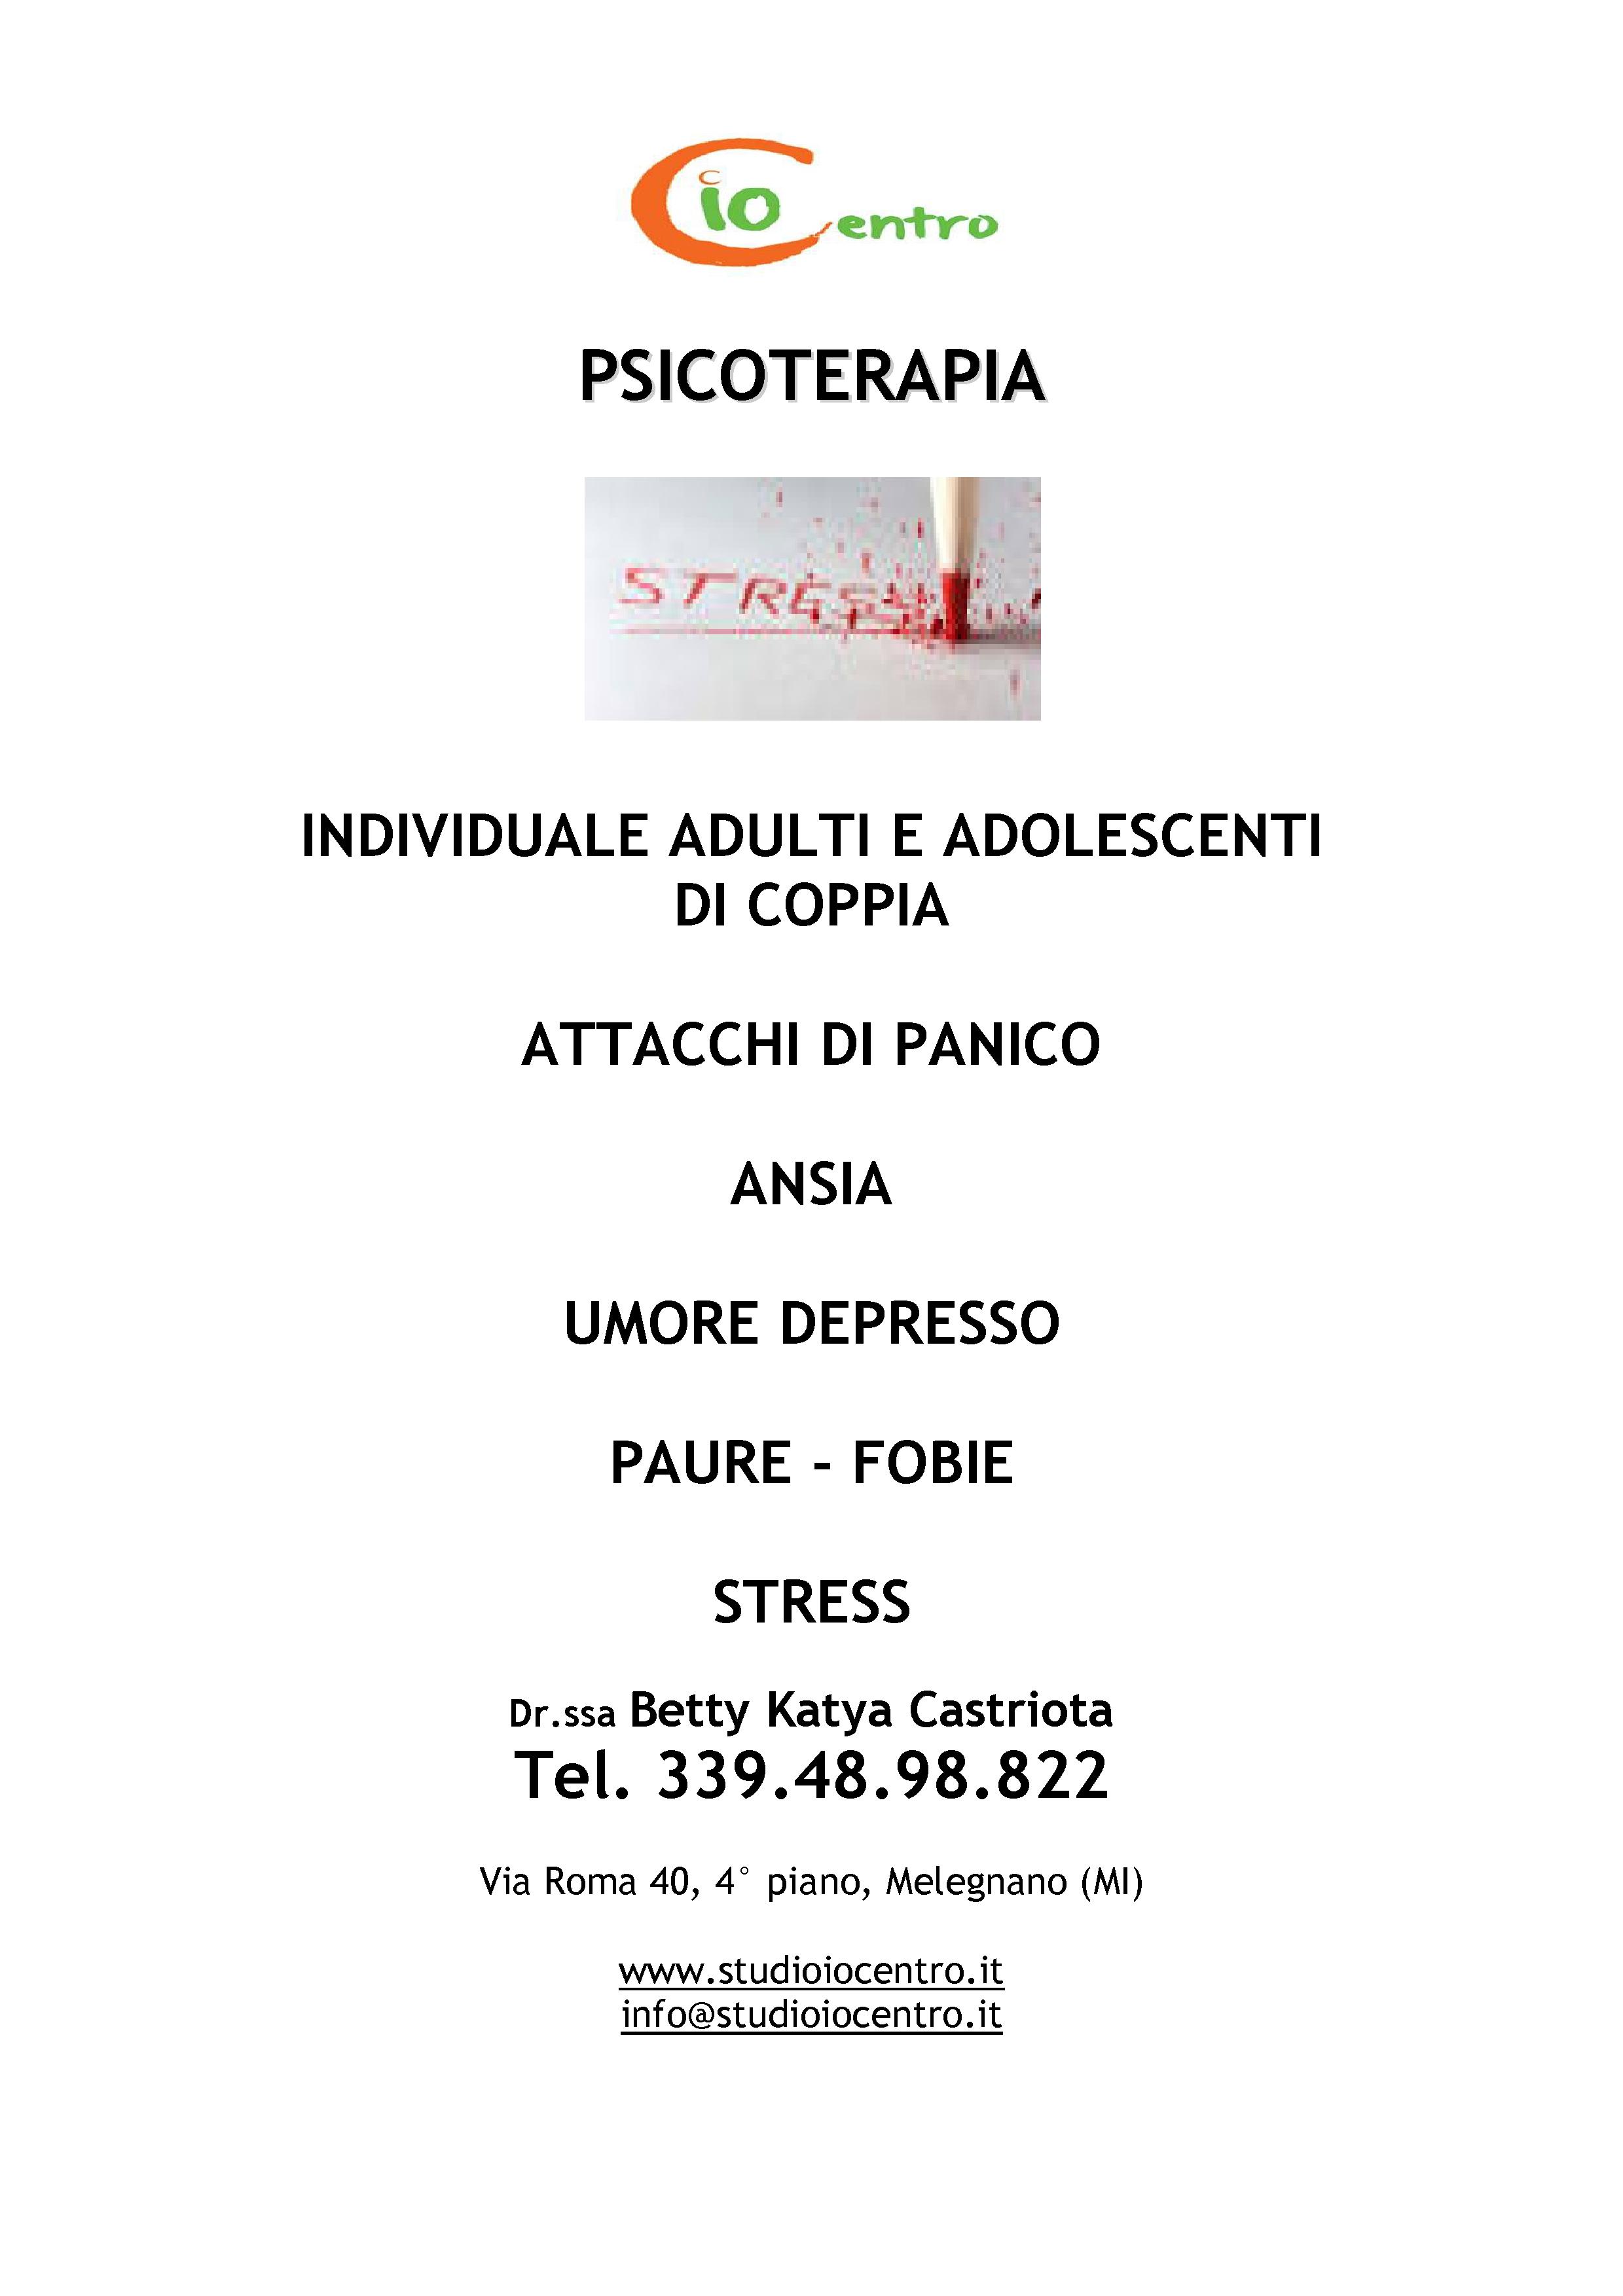 UNICO STRESS E BOTOLA